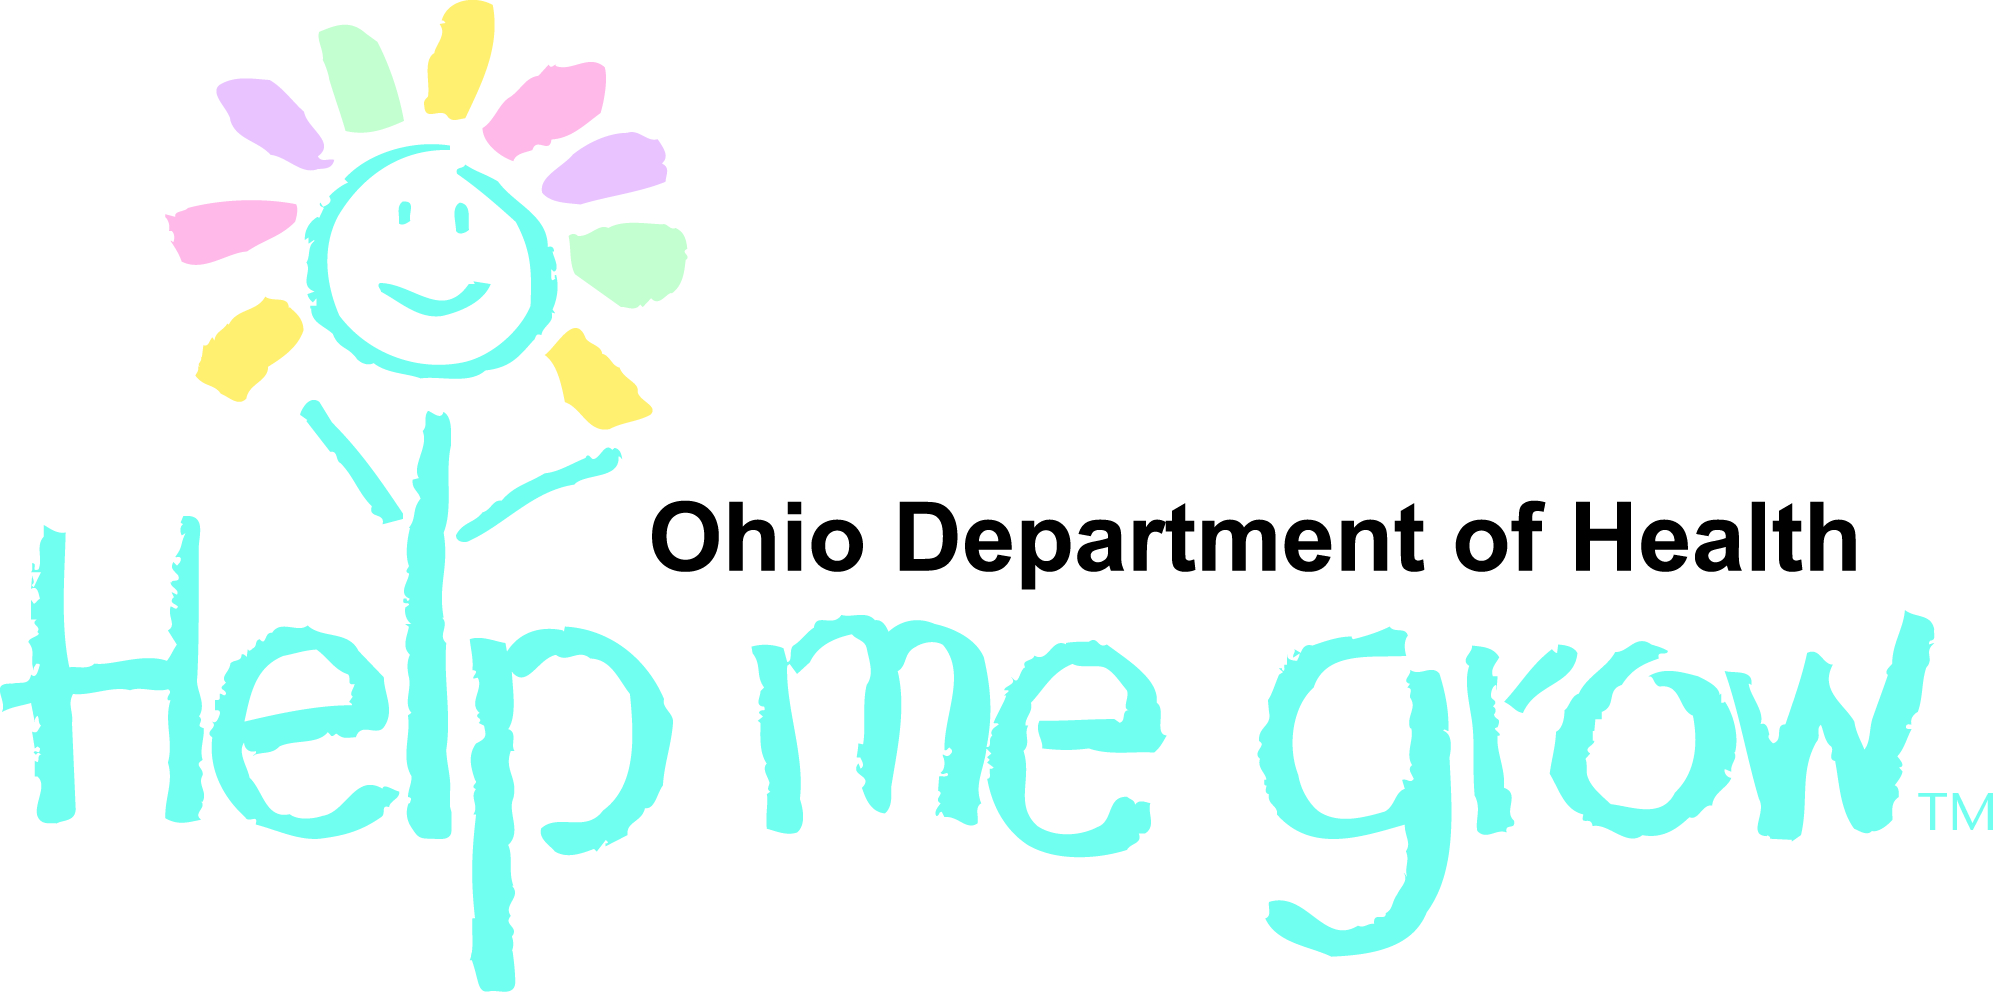 HMG Logo 2013 - ODH